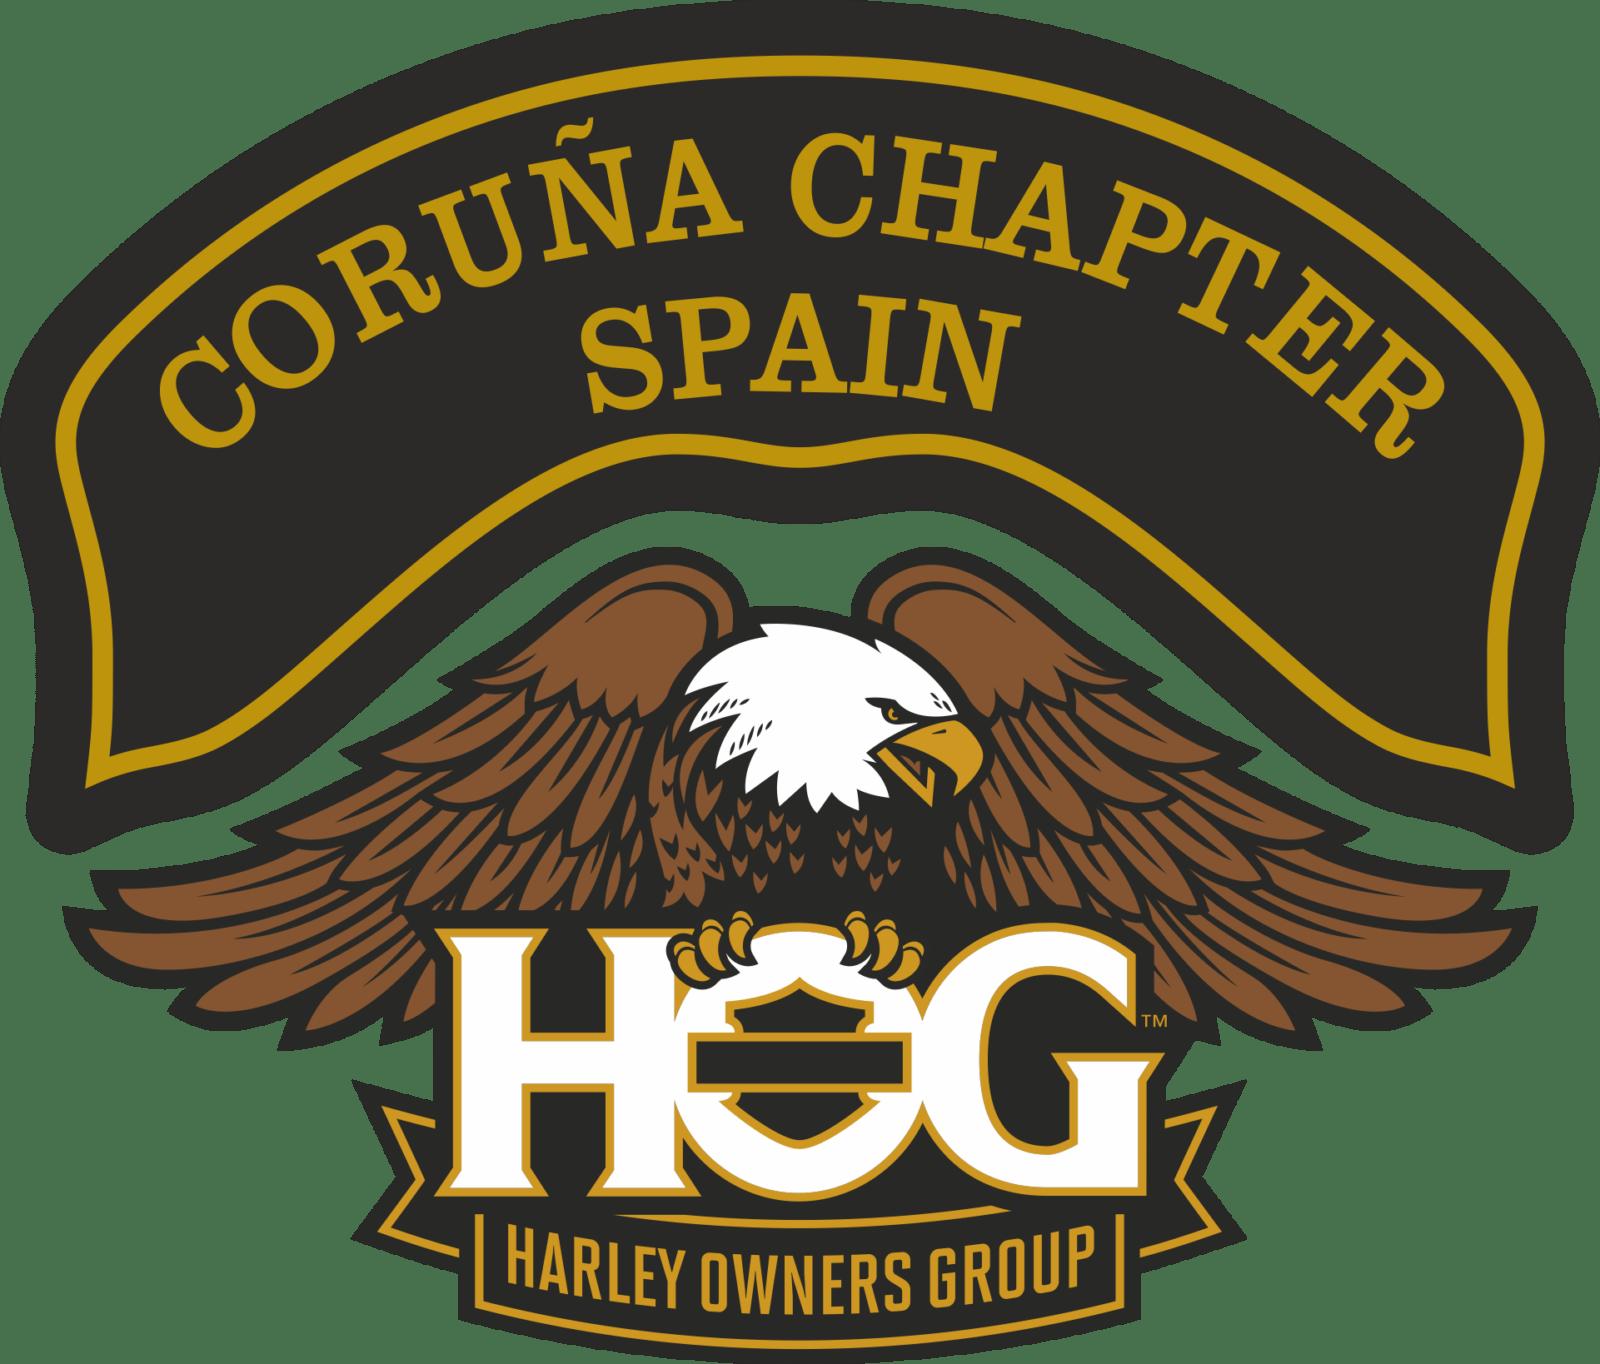 Coruña Chapter